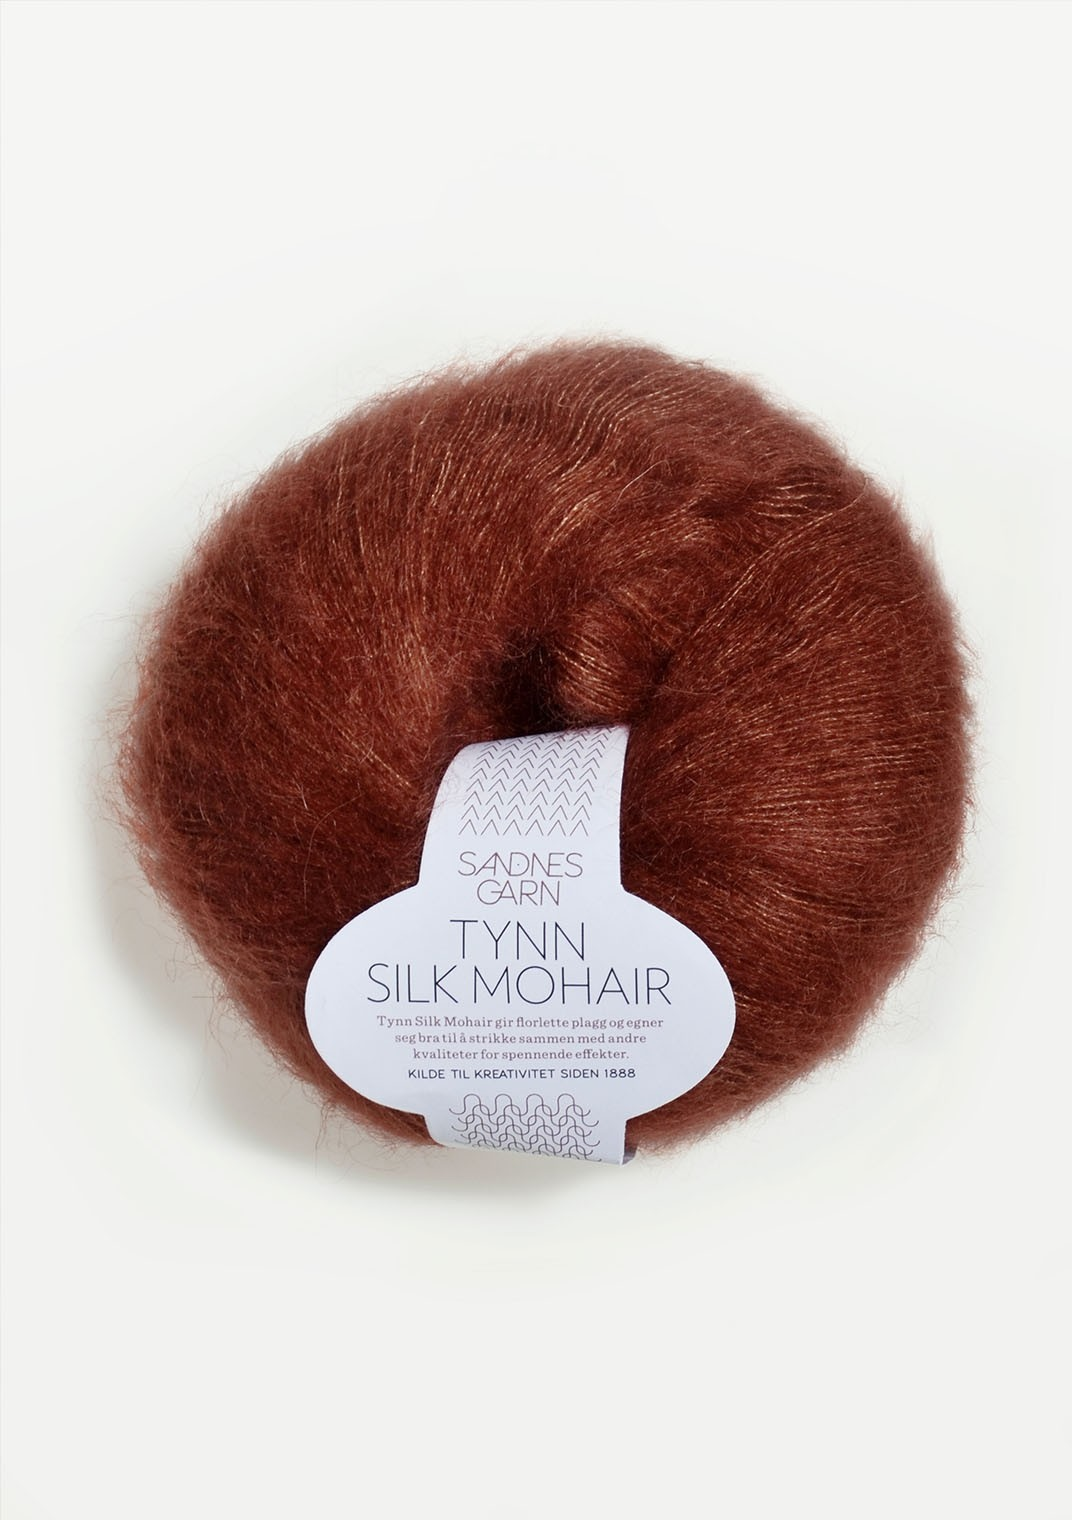 Sandnes 3554 rust Tynn Silk Mohair